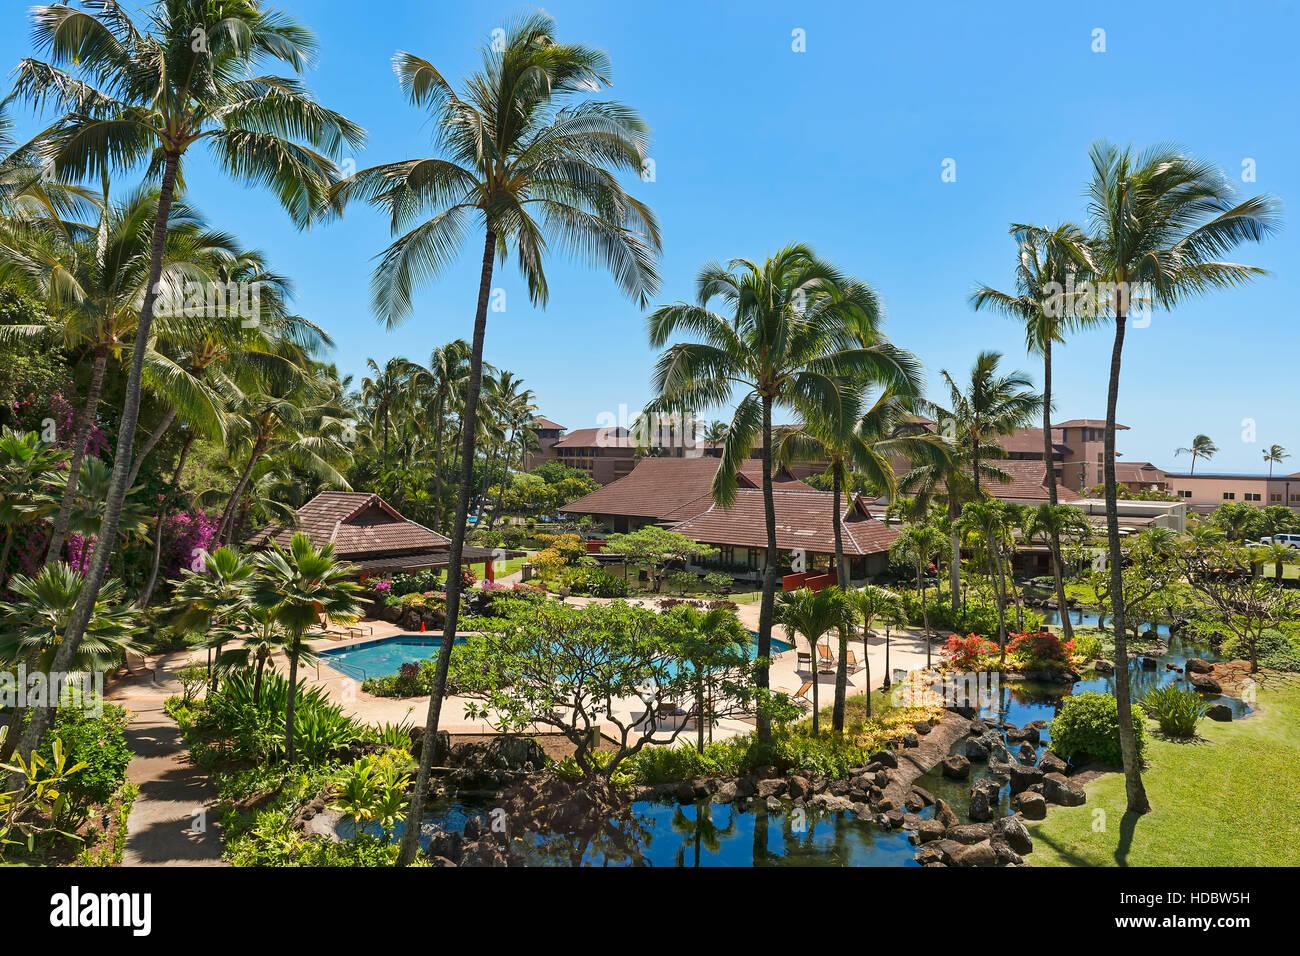 Hôtel resort avec piscine et palmiers, Poipu, Koloa, Kaua&#39;i, Hawaii, USA Banque D'Images